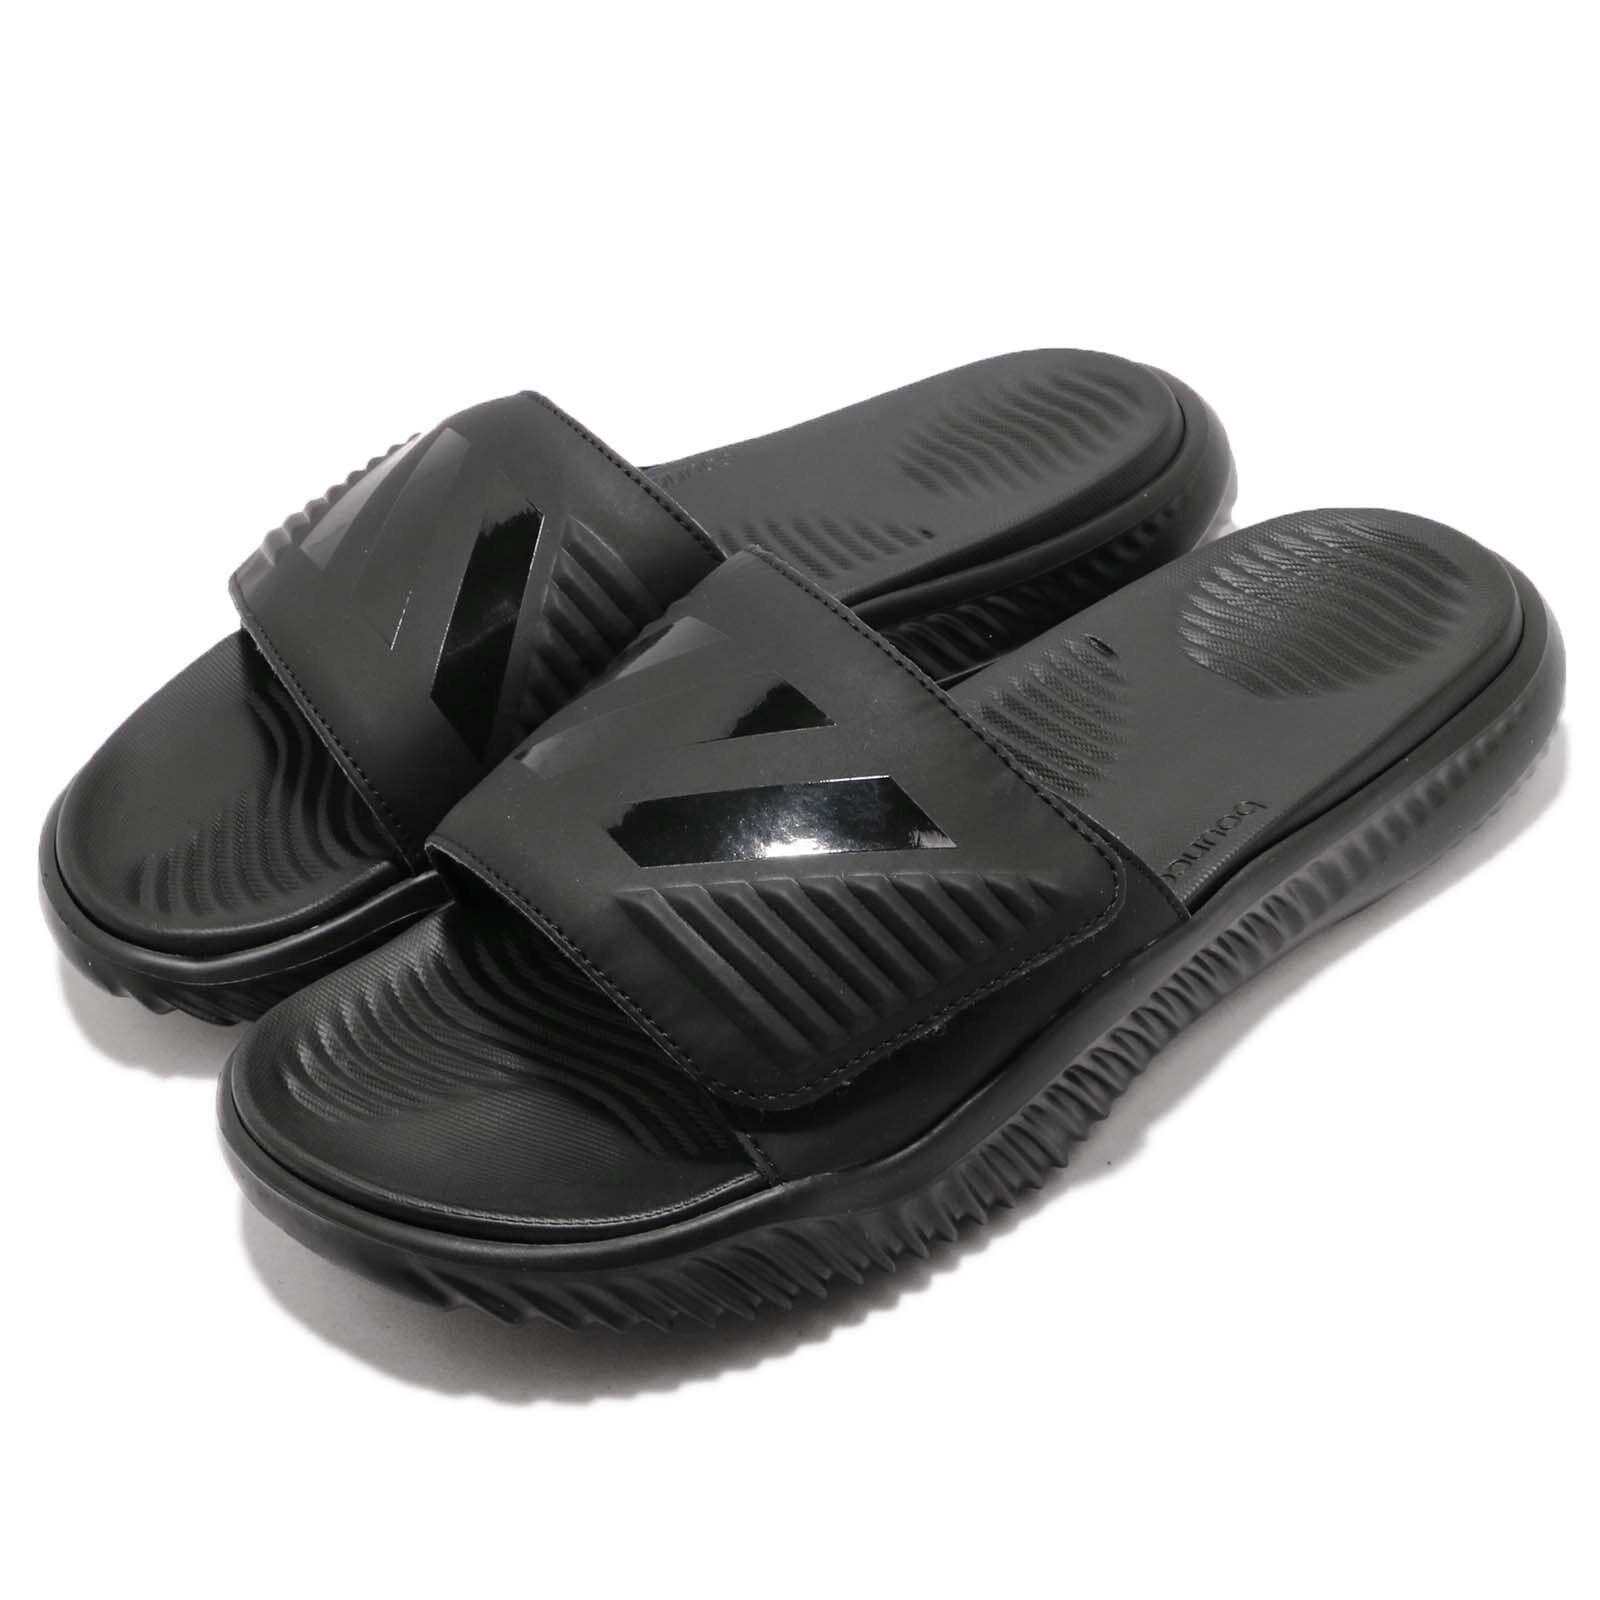 Adidas AlphaBounce Slide Triple nero Men  Sports Sandals Panthers B41720  sconti e altro